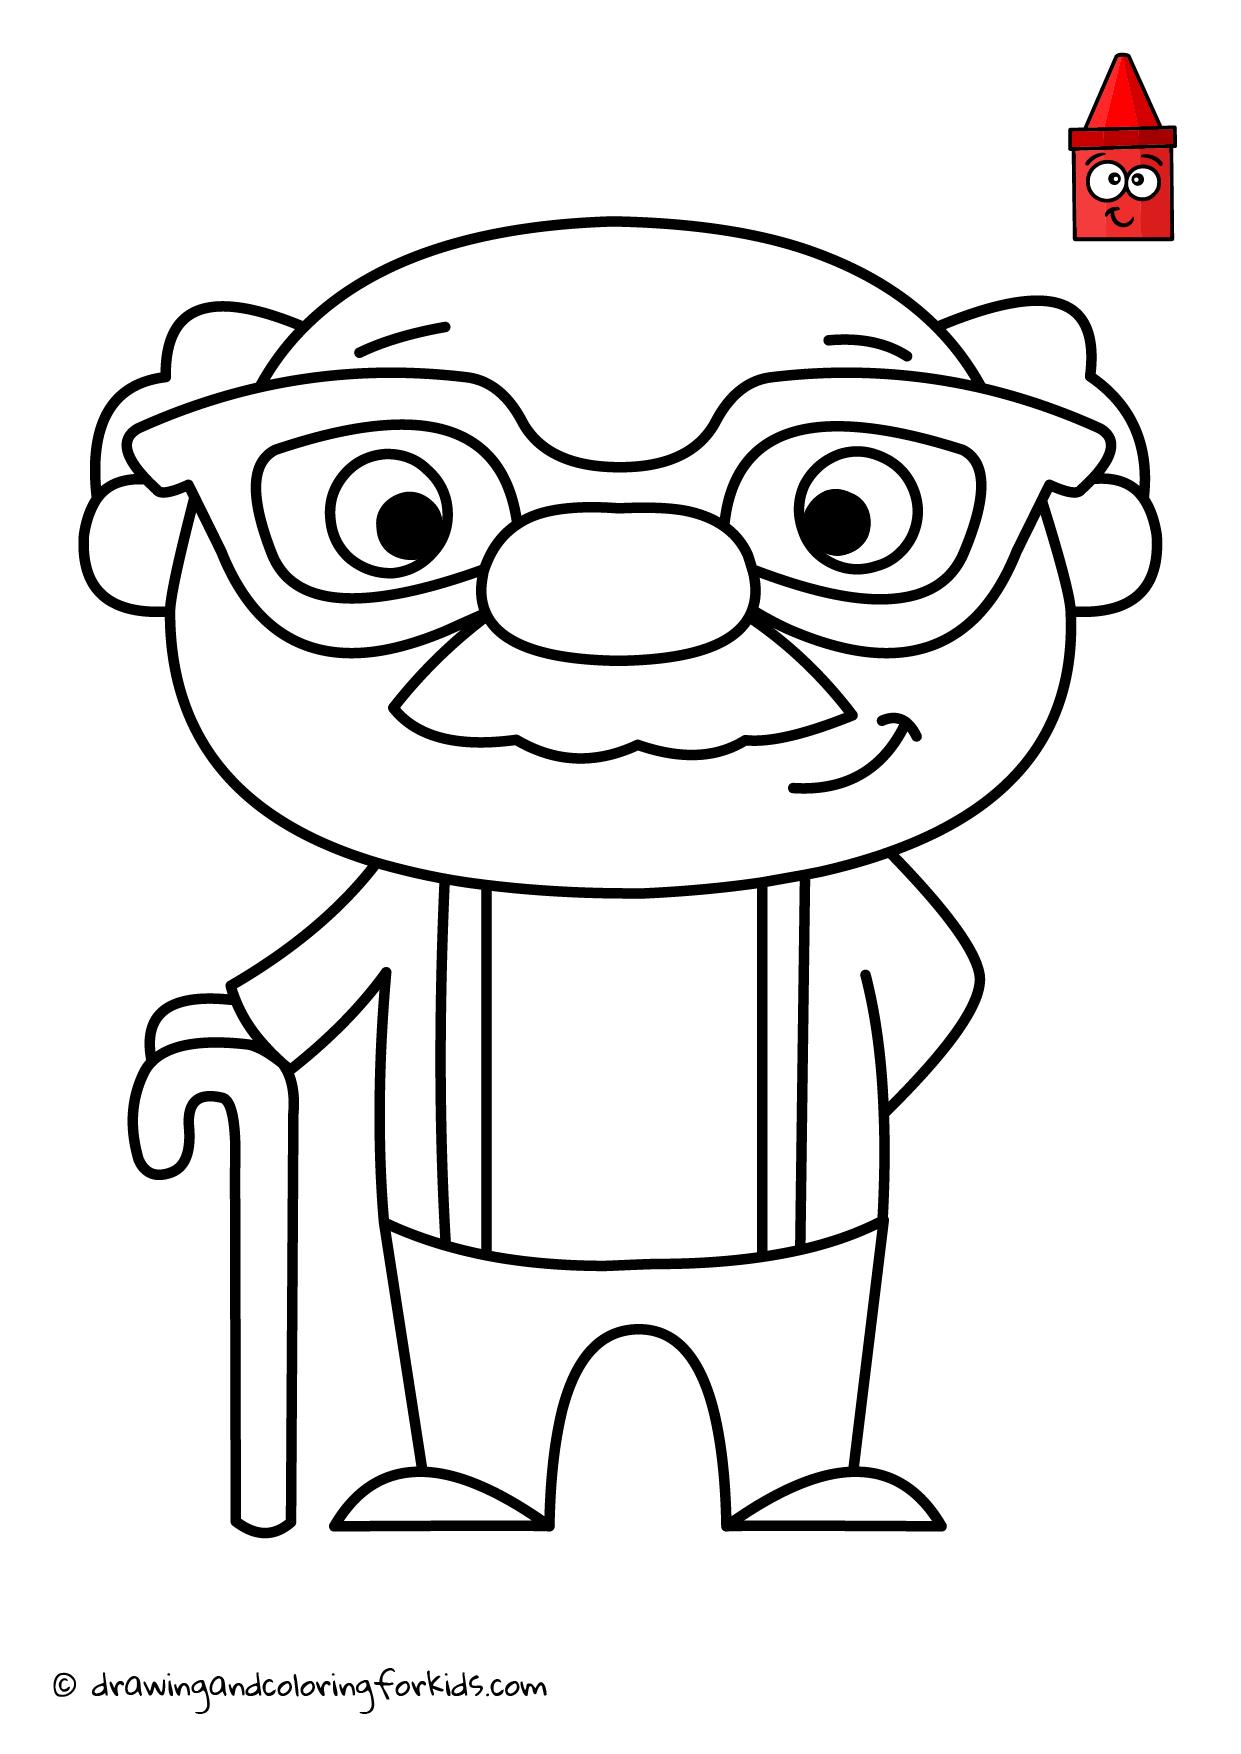 Grandpa Drawing | Drawing Grandparents | Funny Grandfather ...